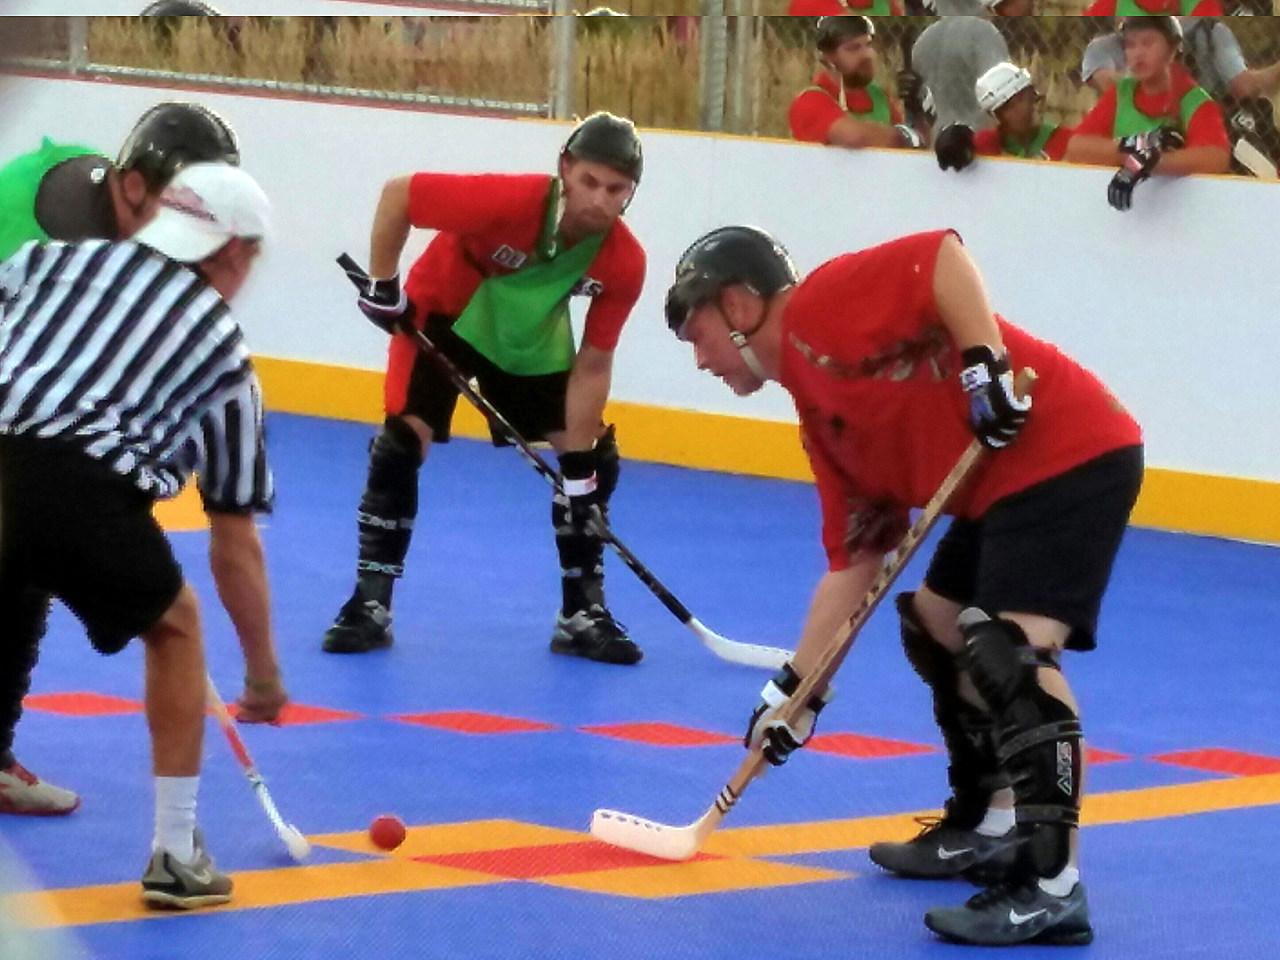 My First Dek Hockey Game, I Survived